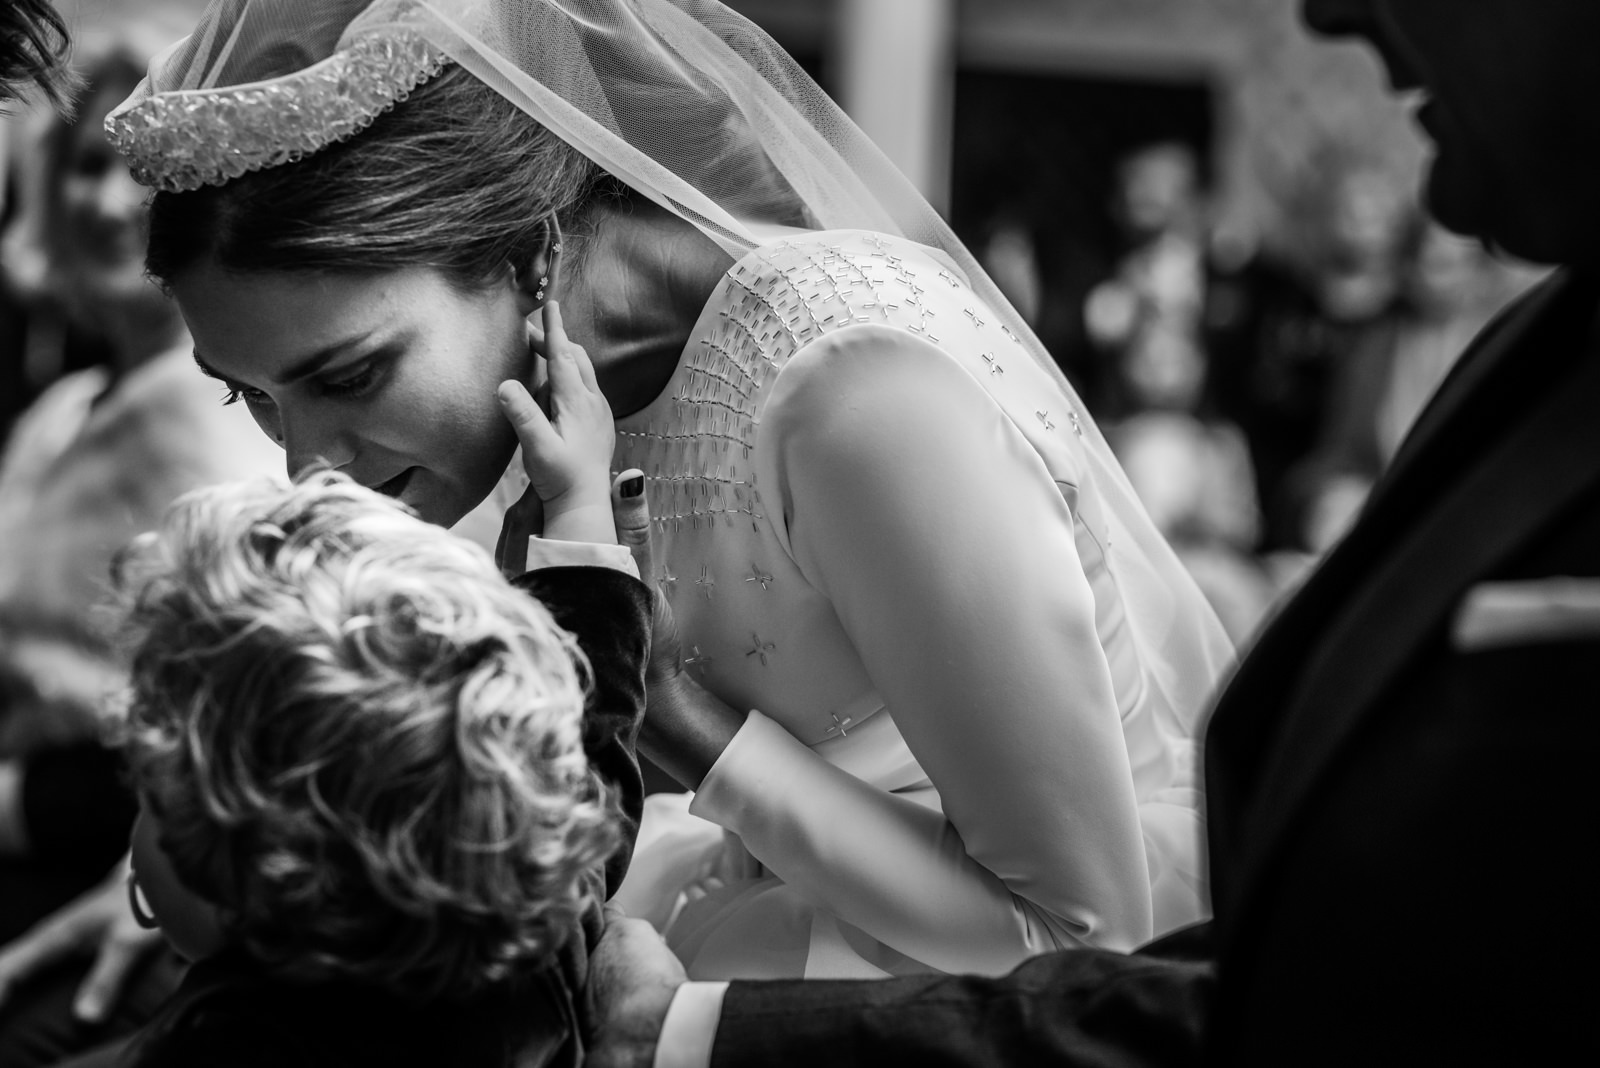 Boda-Sevilla-Parador-Carmona-bridal-engagement-Rafael-Torres-fotografo-bodas-sevilla-madrid-barcelona-wedding-photographer--36.jpg